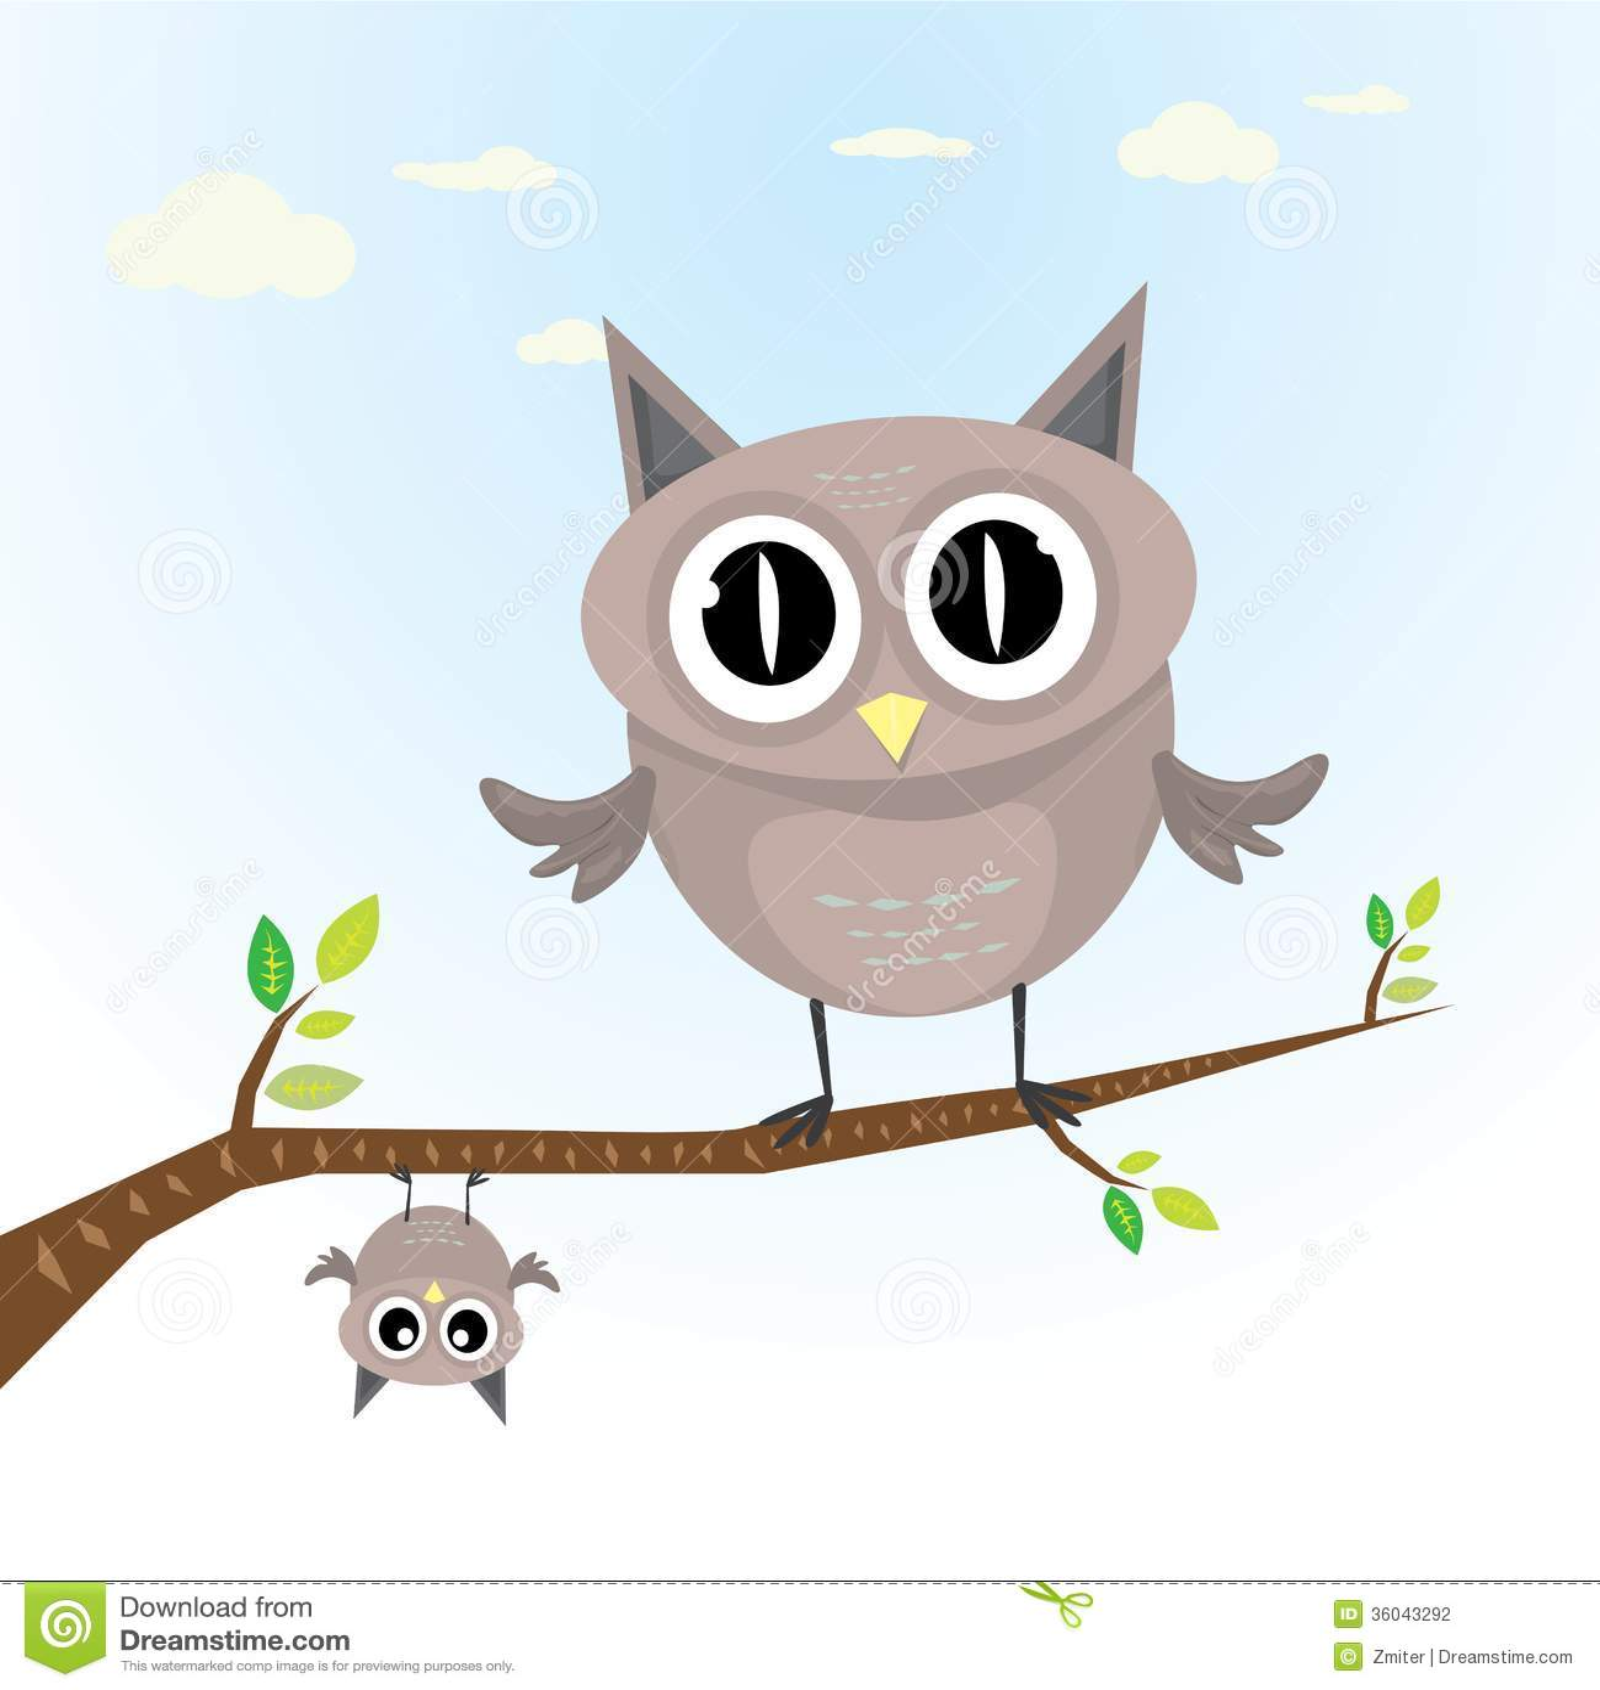 Cute cartoon owls on a branch - photo#13